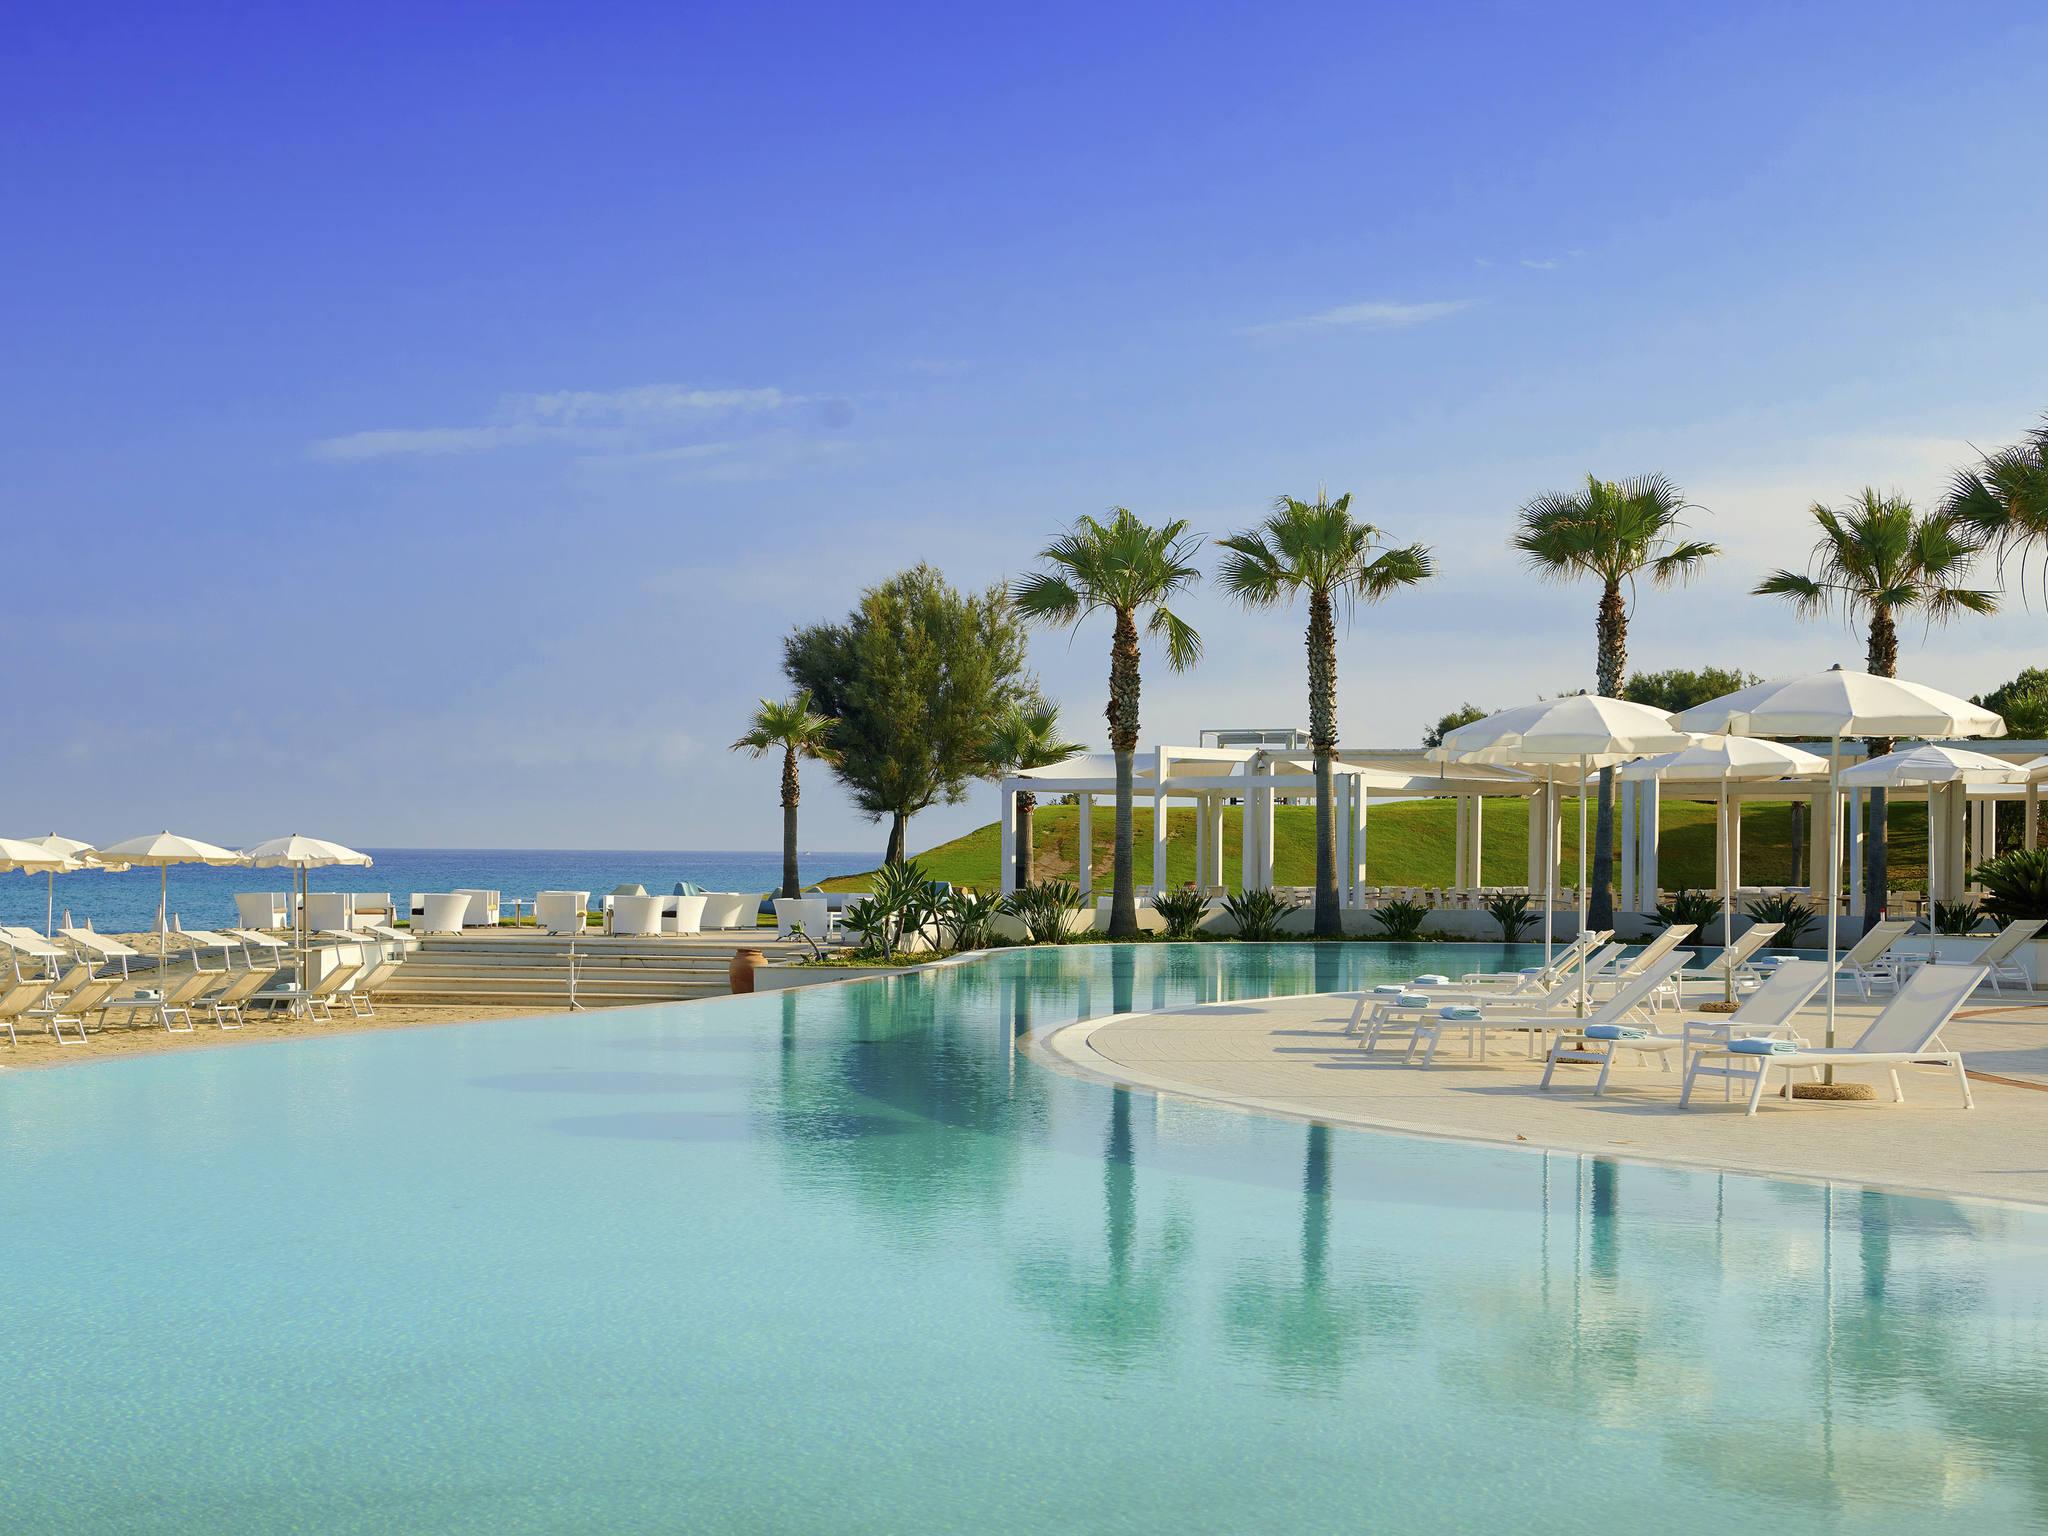 Otel – Capovaticano Resort Thalasso & Spa - MGallery by Sofitel